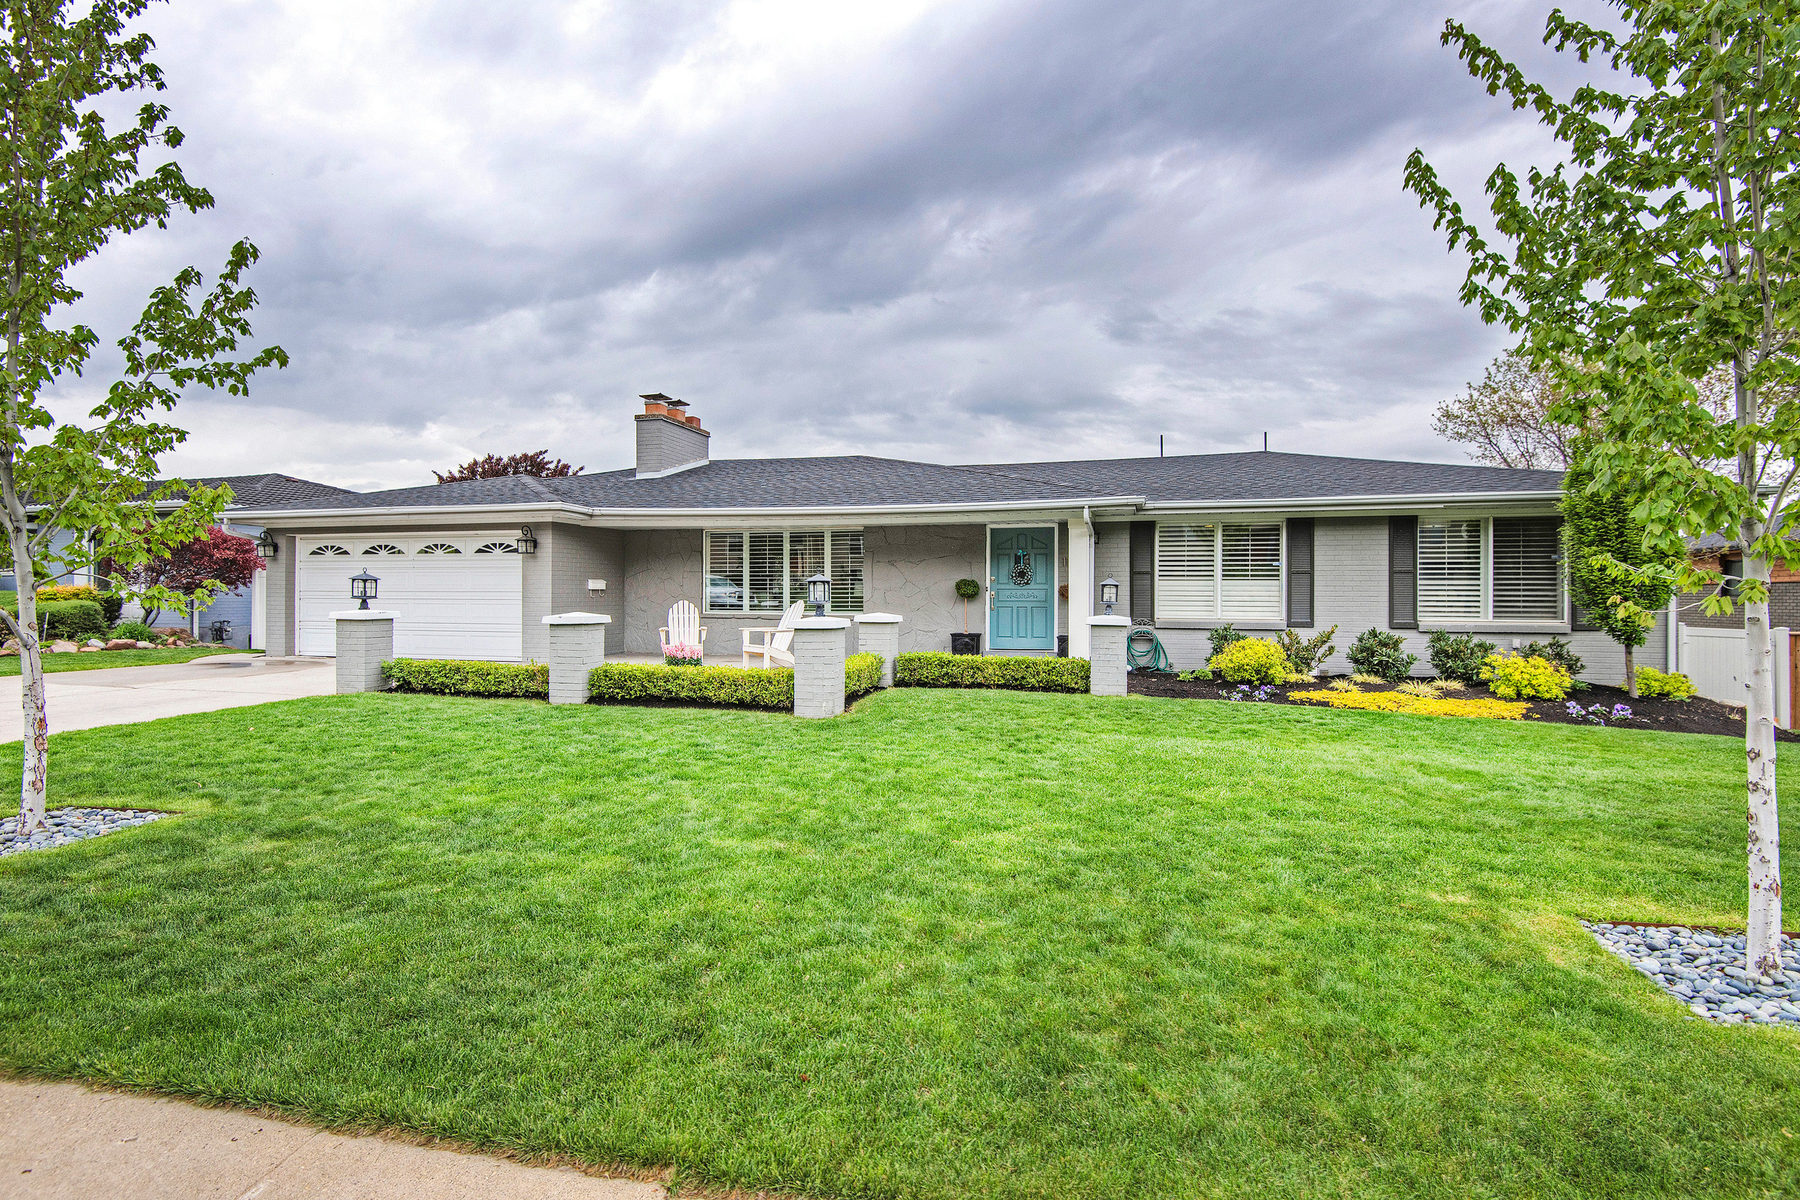 Villa per Vendita alle ore Wonderful Rambler with Views in Exclusive St. Mary's 1100 S Oak Hills Way Salt Lake City, Utah 84108 Stati Uniti